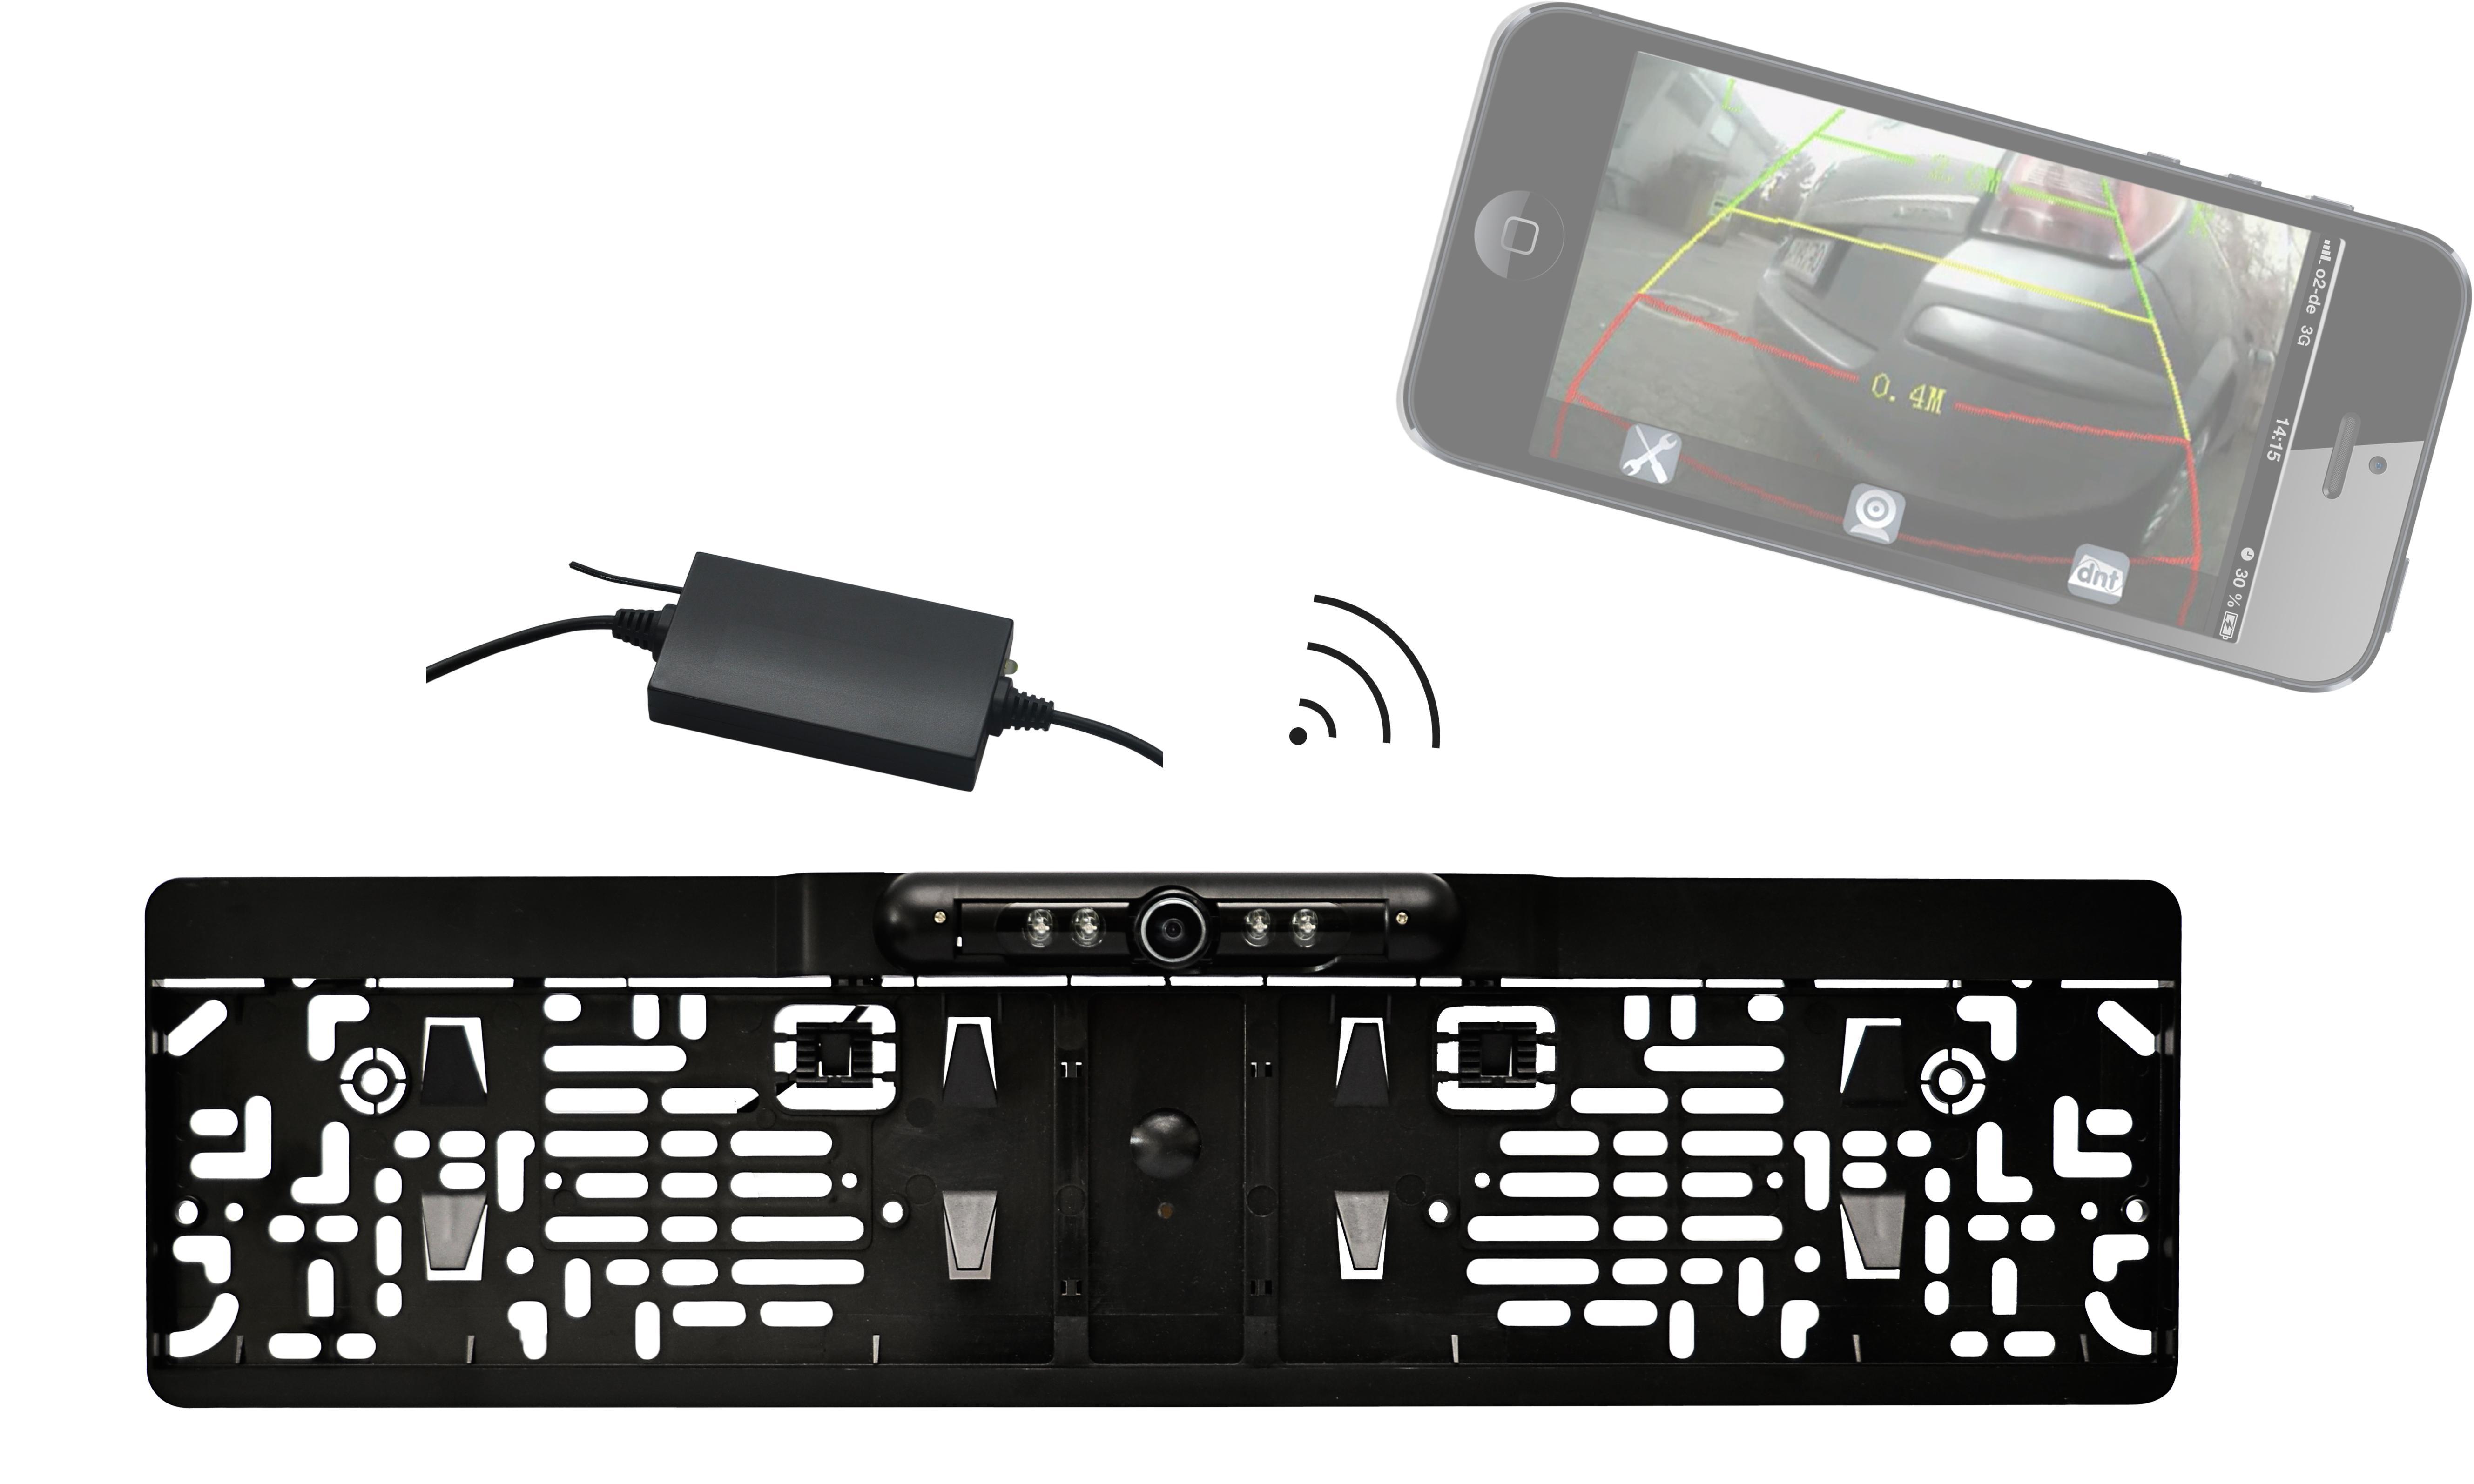 rfk wifi r ckfahr kamera system mit smartphone app amazon. Black Bedroom Furniture Sets. Home Design Ideas